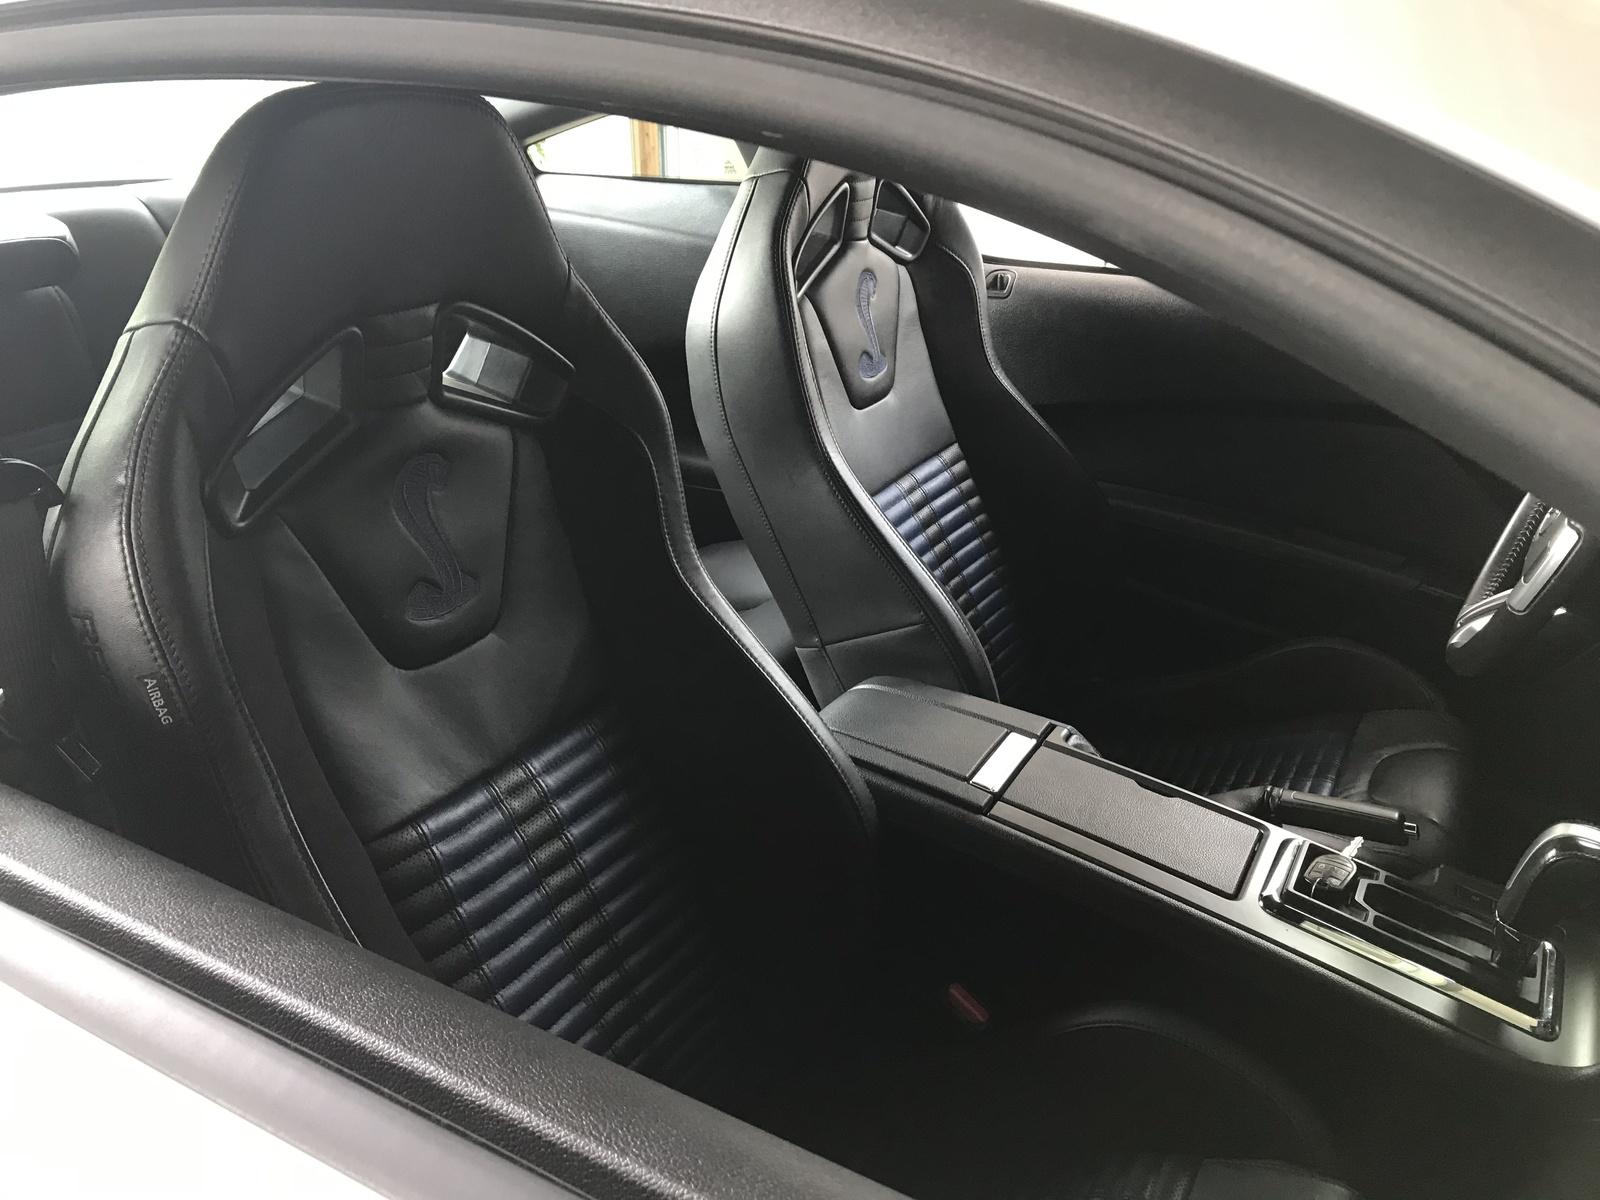 13 14 Gt500 Recaro Seats For Sale Svtperformance Com